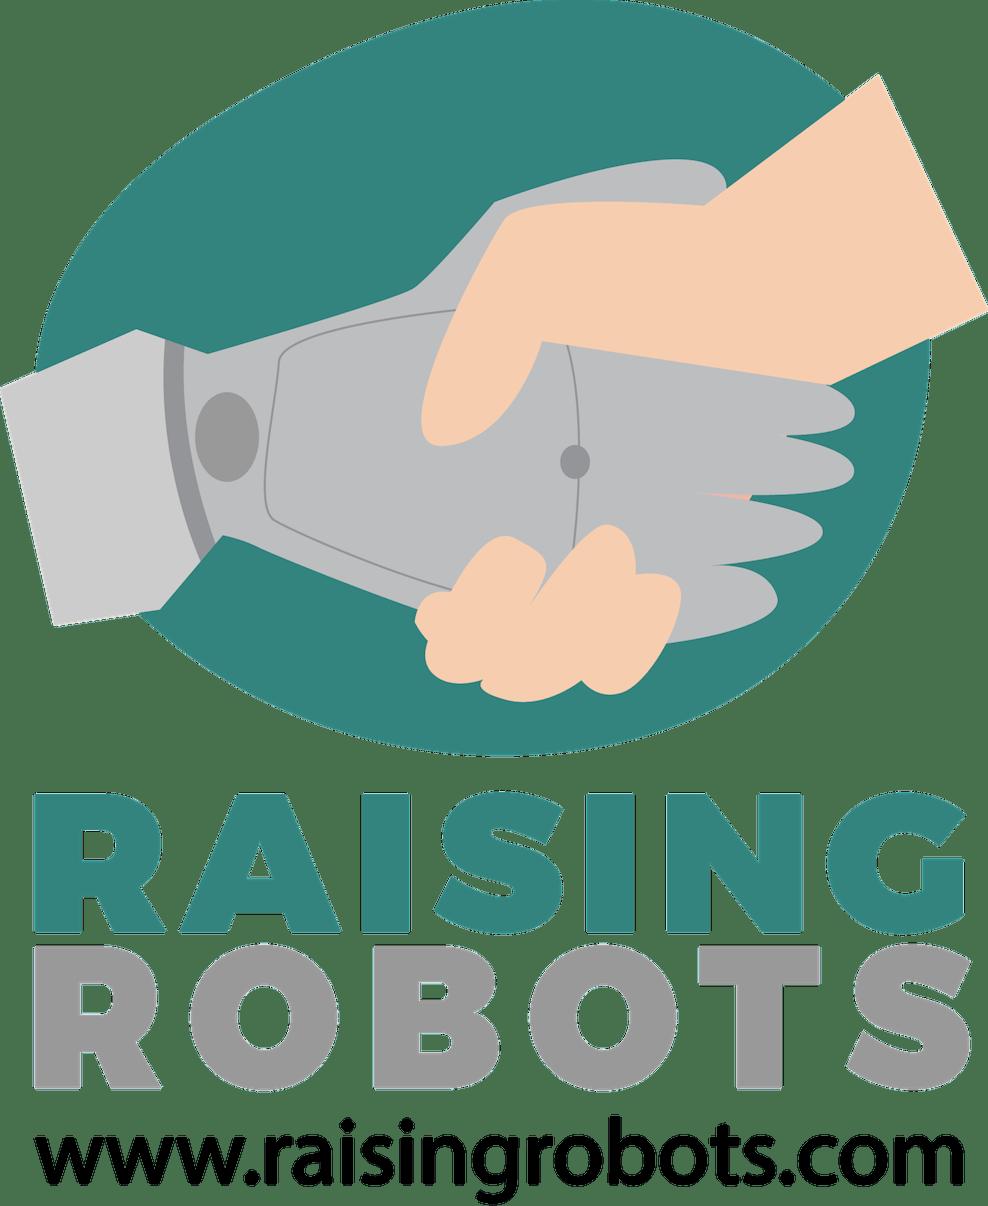 Raising Robots